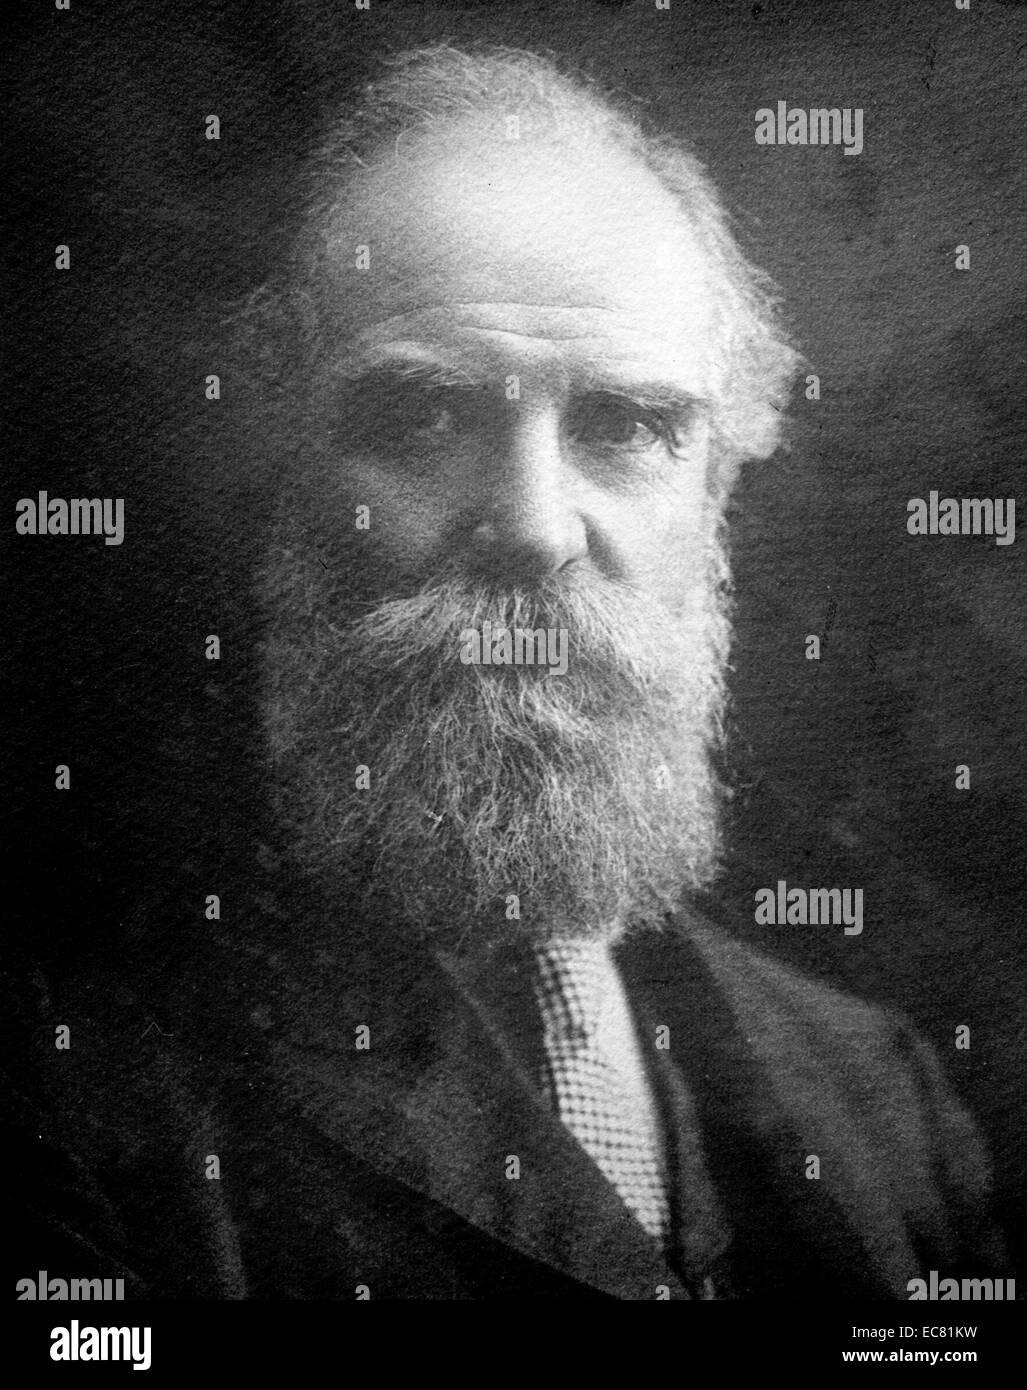 Photograph of Nikolai Tchaikovsky (1851-1926) Russian revolutionary. Dated 1920 - Stock Image